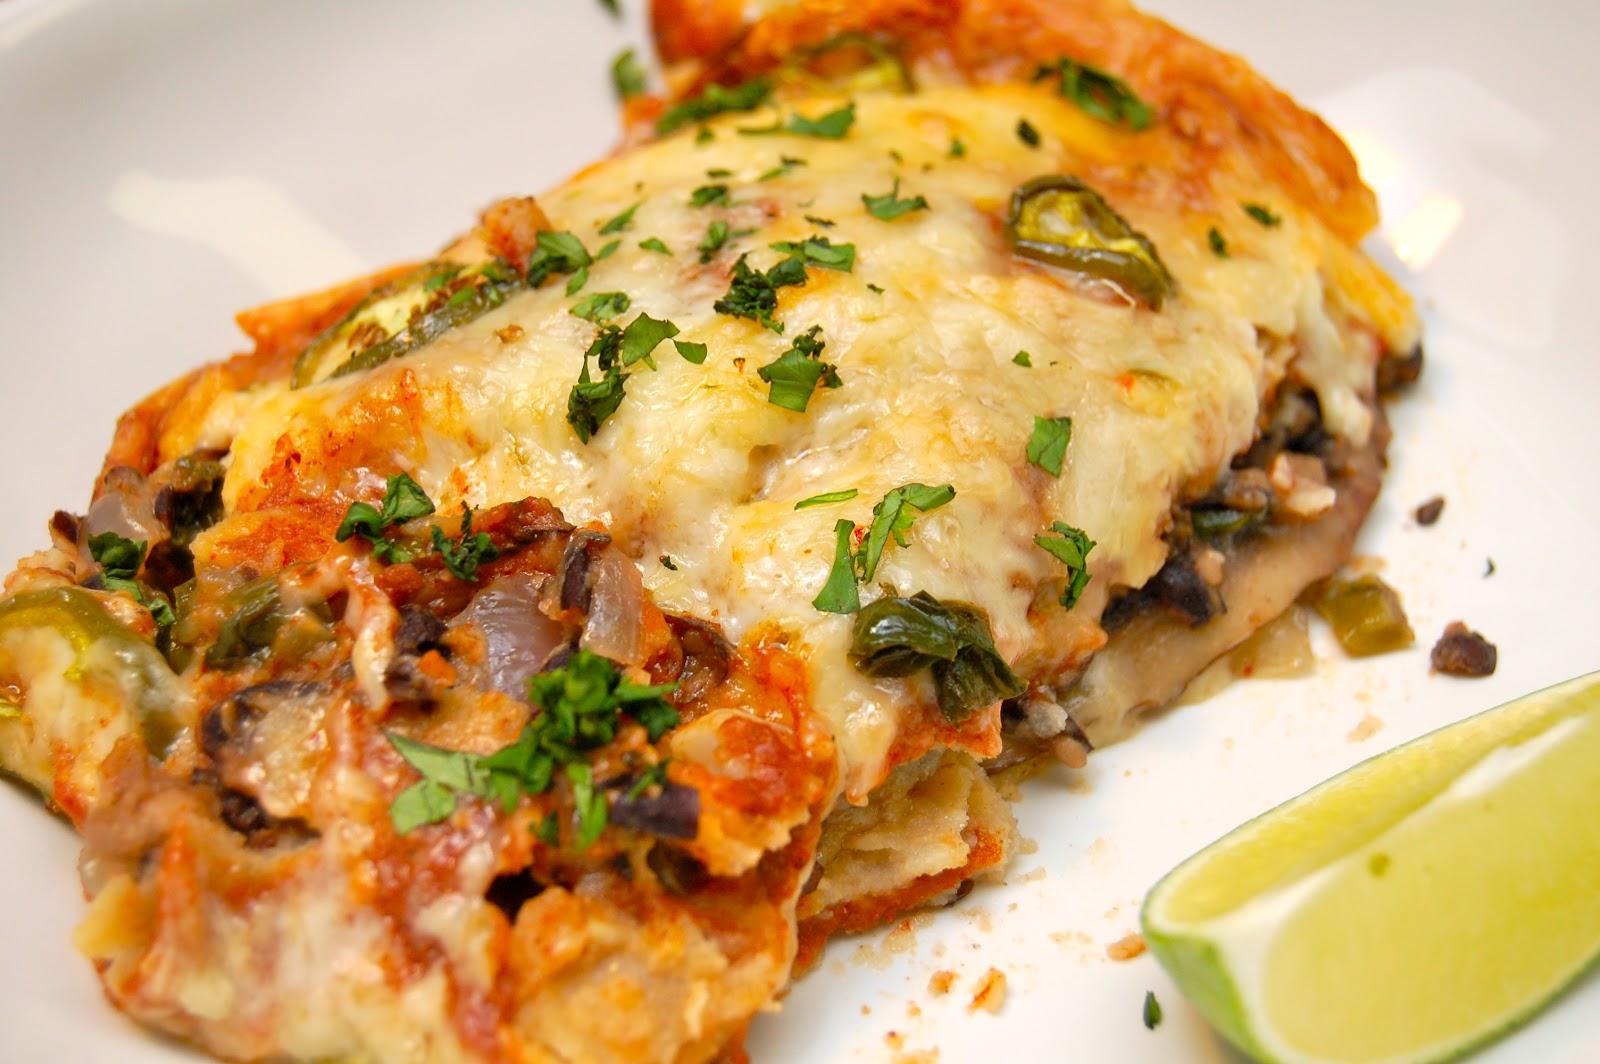 sauce enchiladas verdes enchiladas enchiladas chicken enchiladas ...